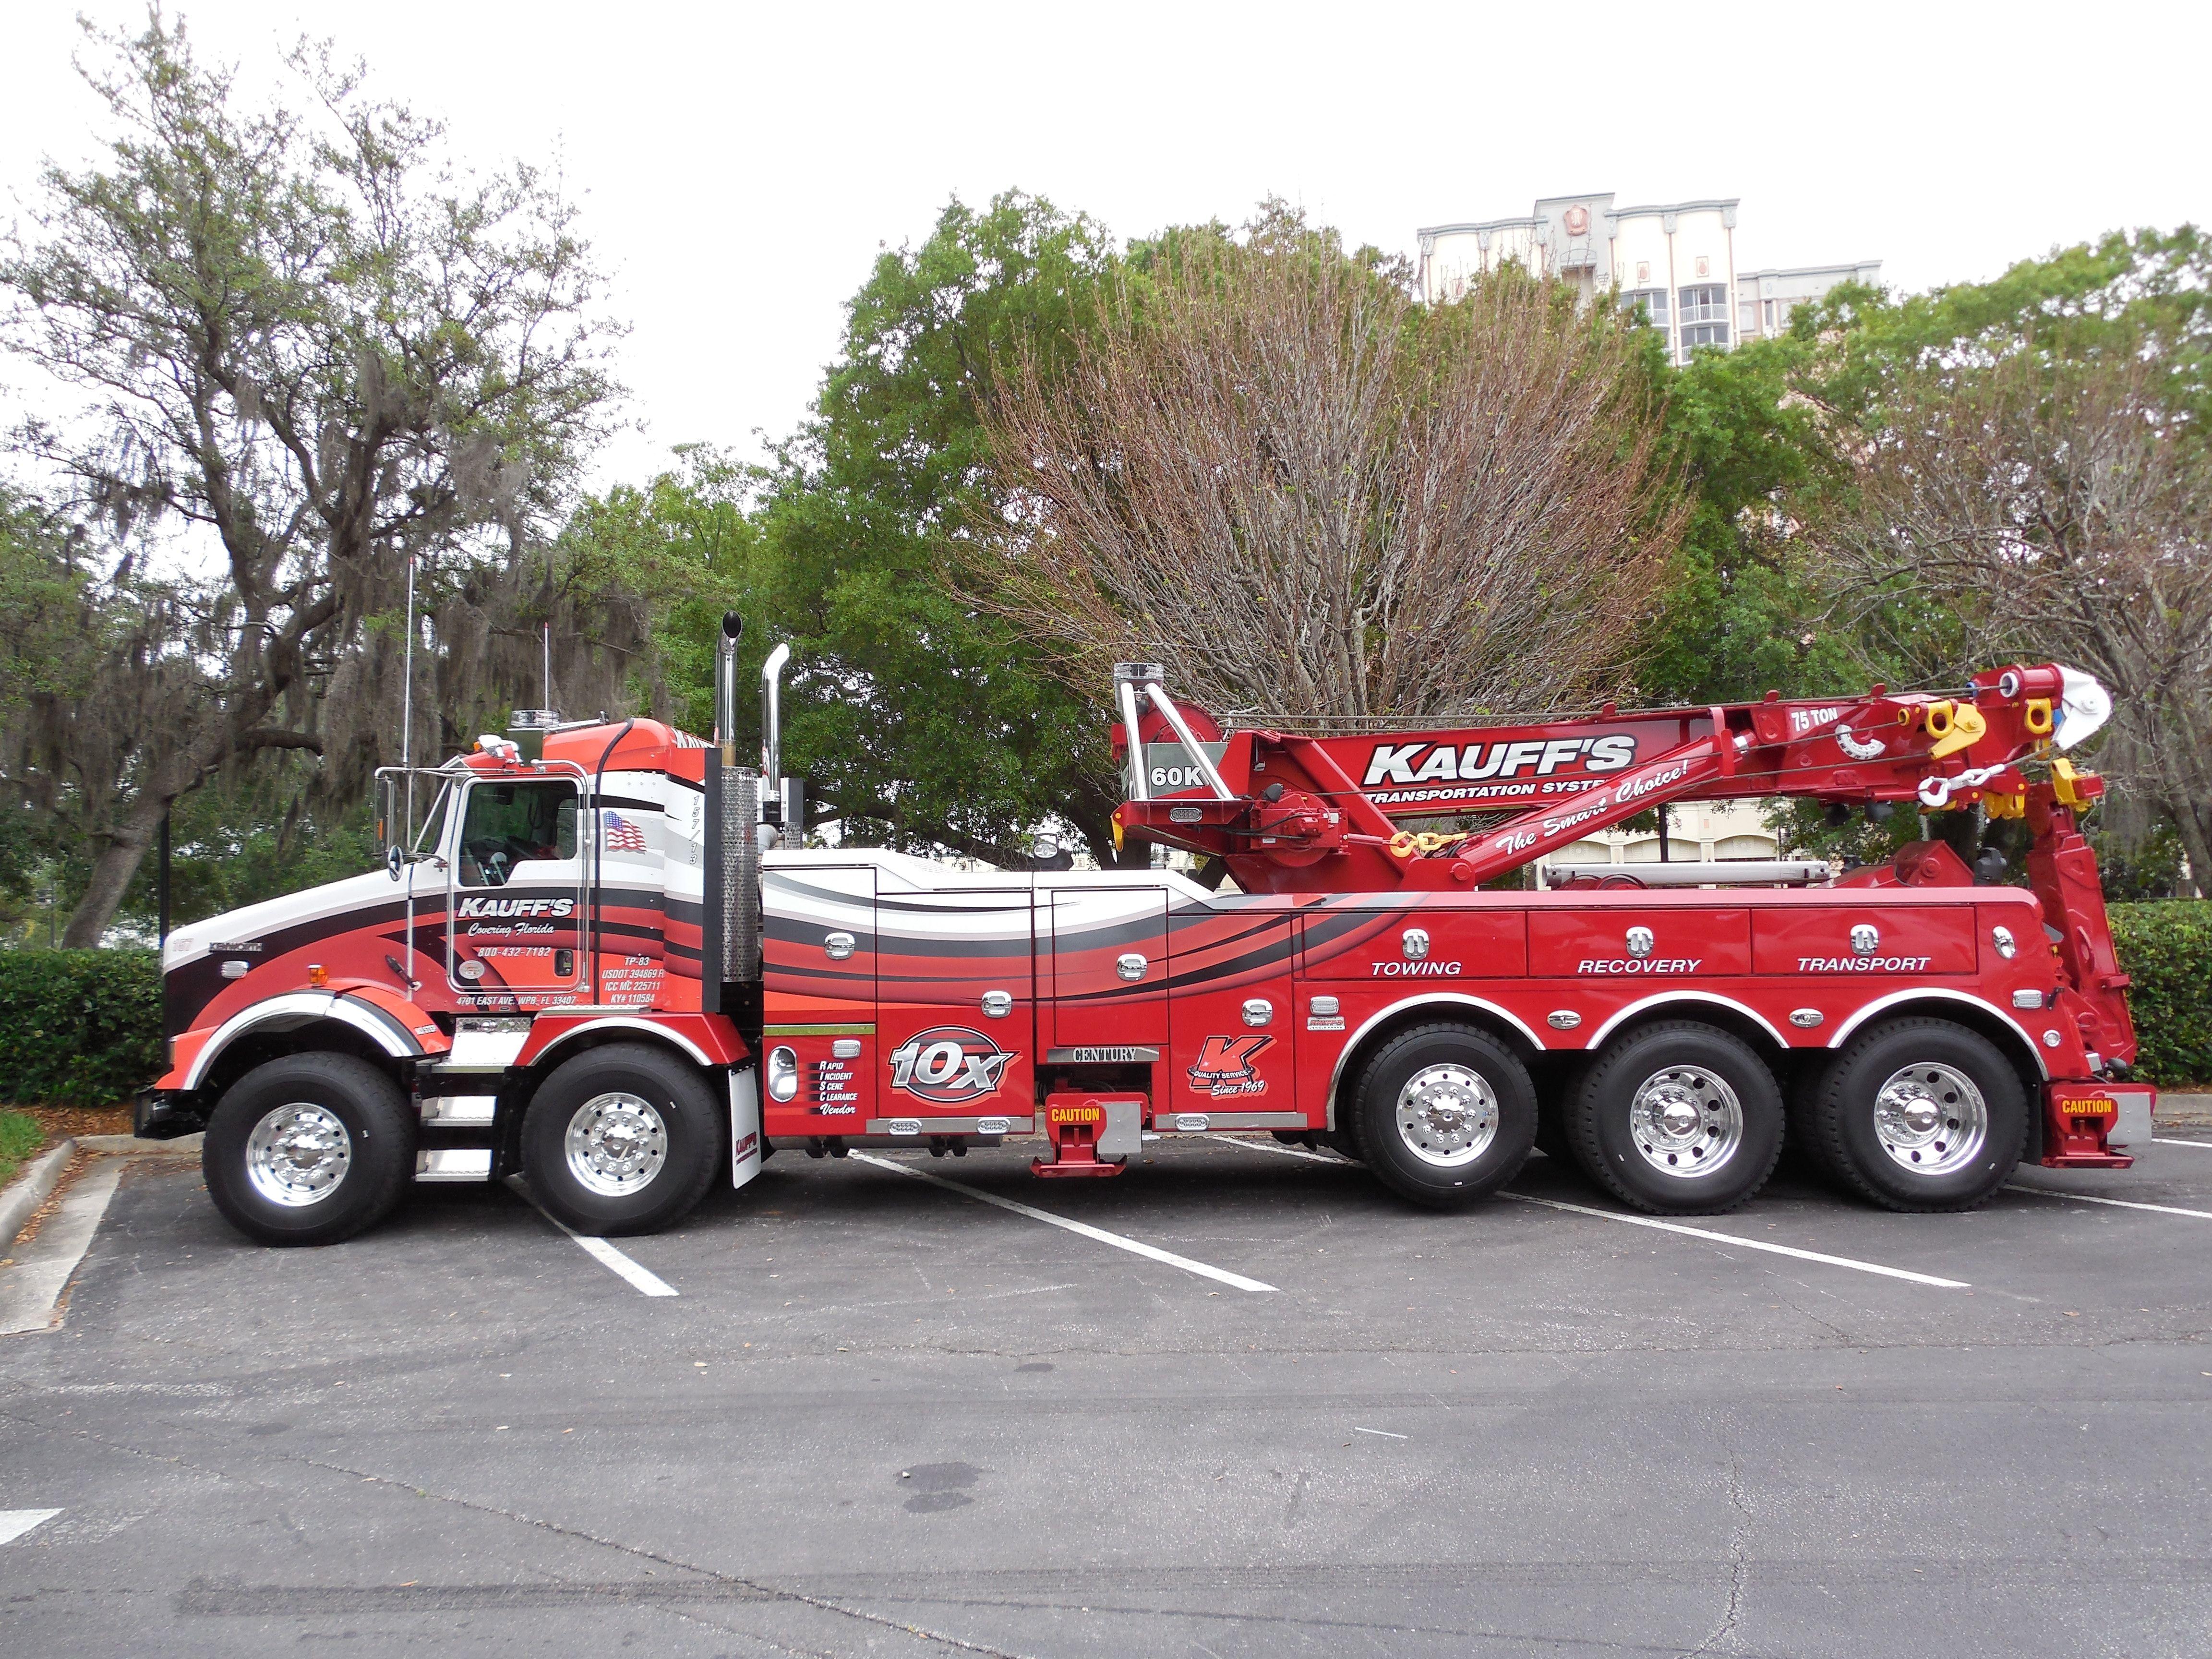 Kauff s Transportation Systems West Palm Beach FL Kenworth T800